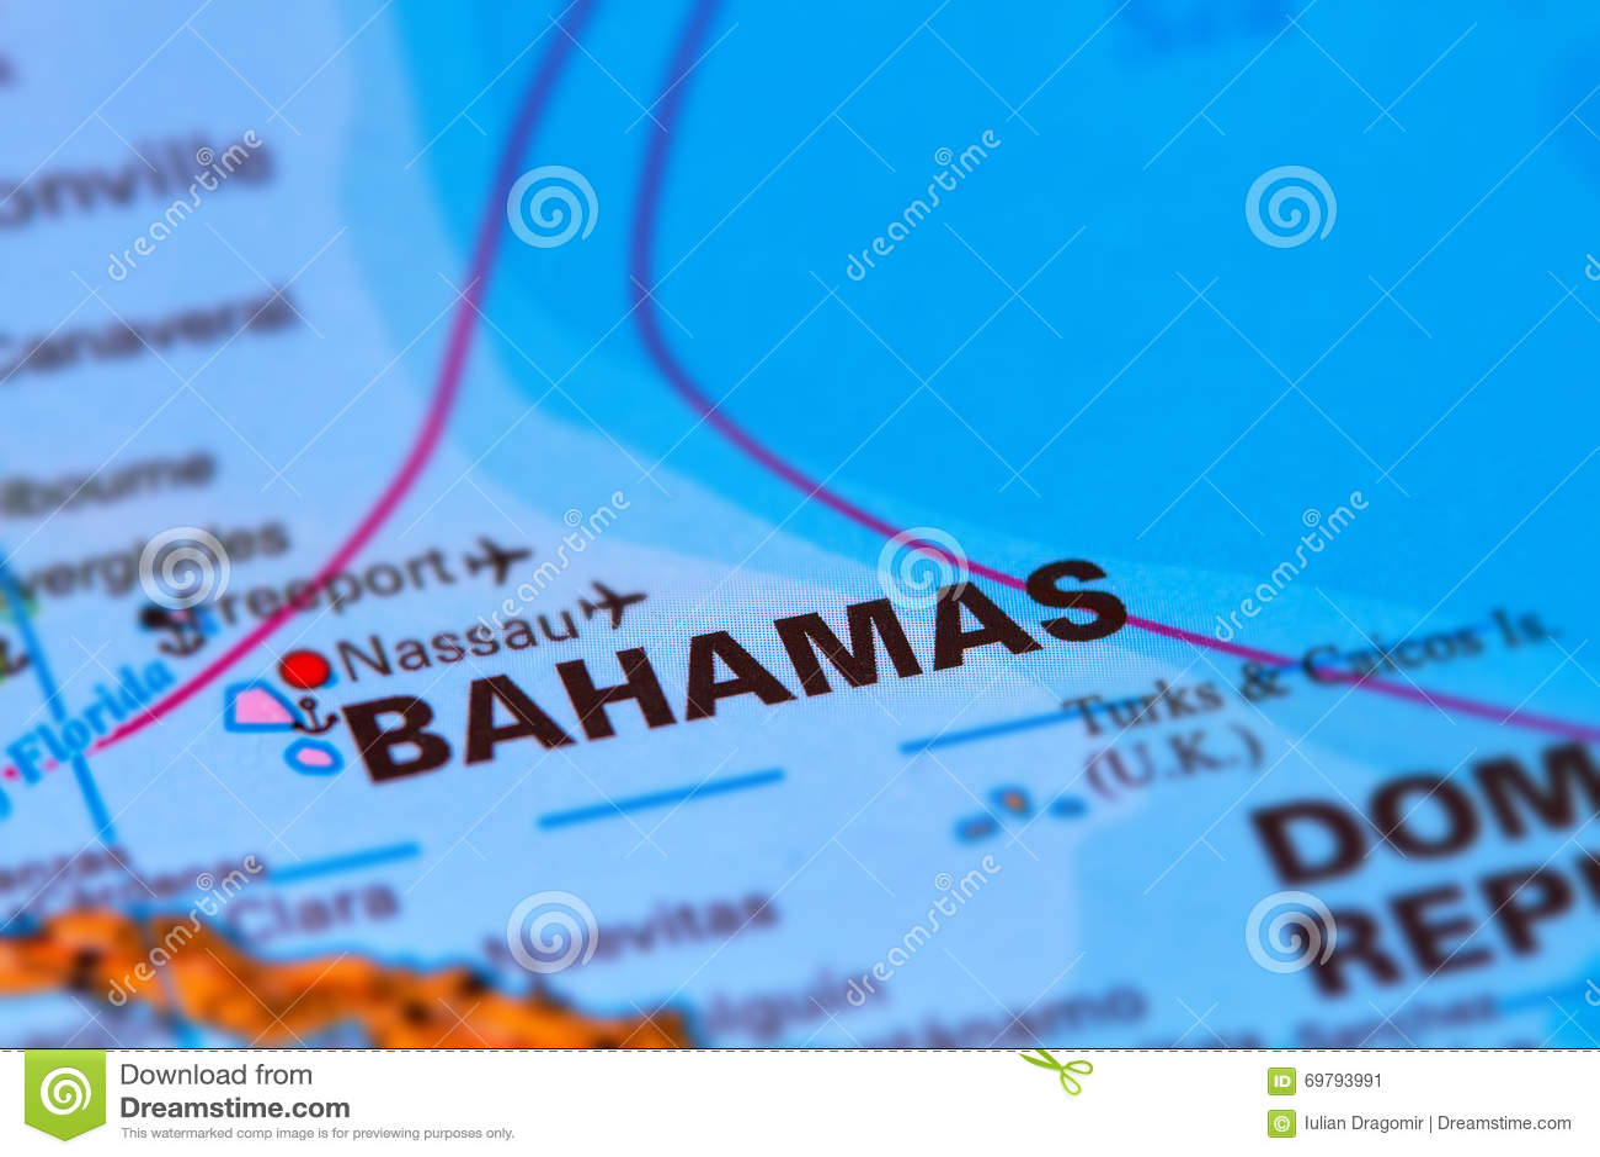 Bahamas Caribbean Island on Map